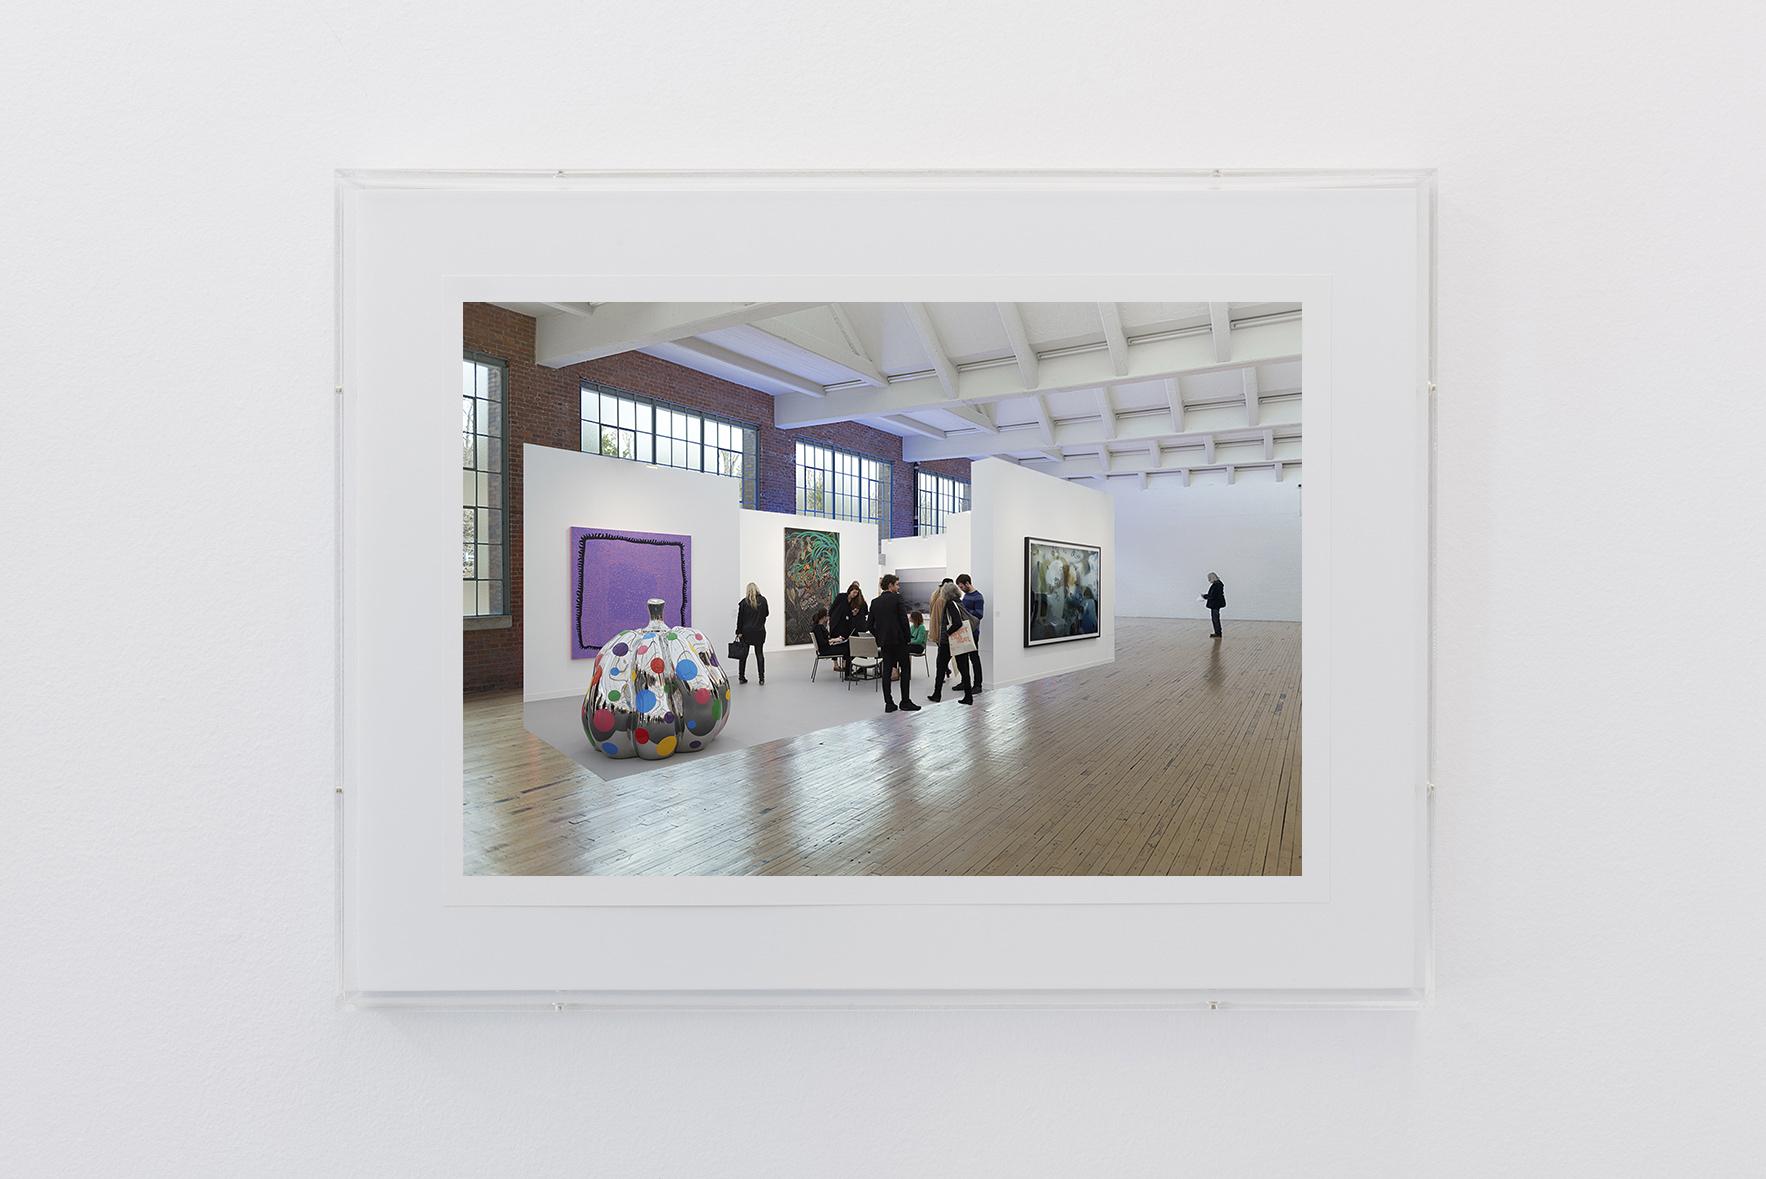 David Zwirner at Frieze London 2015/ DIA Foundation - Best Booths series